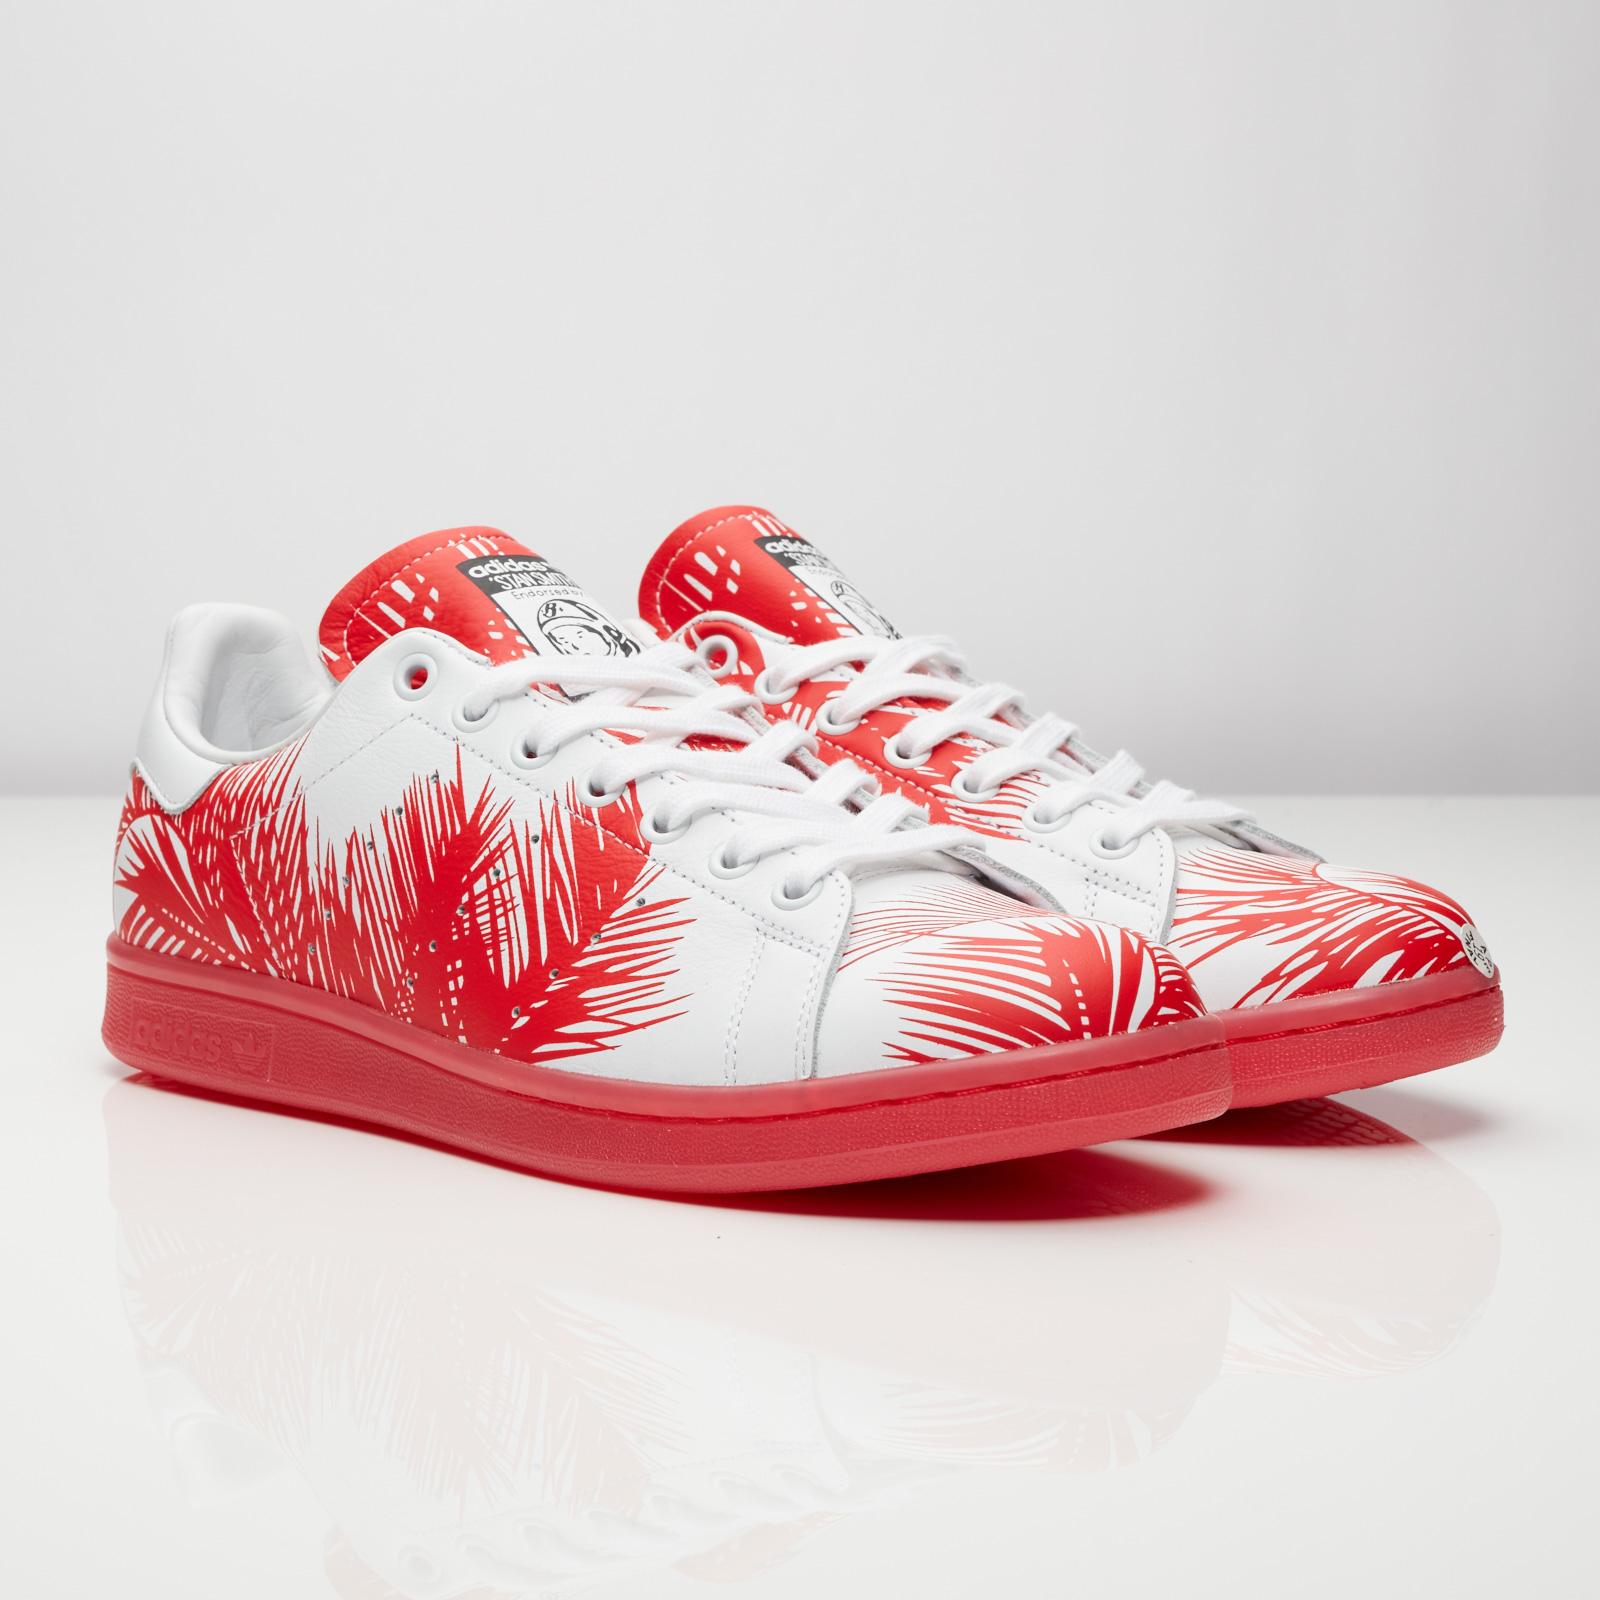 d3cc8af1349 adidas PW Stan Smith BBC Palm Tree - S82072 - Sneakersnstuff ...